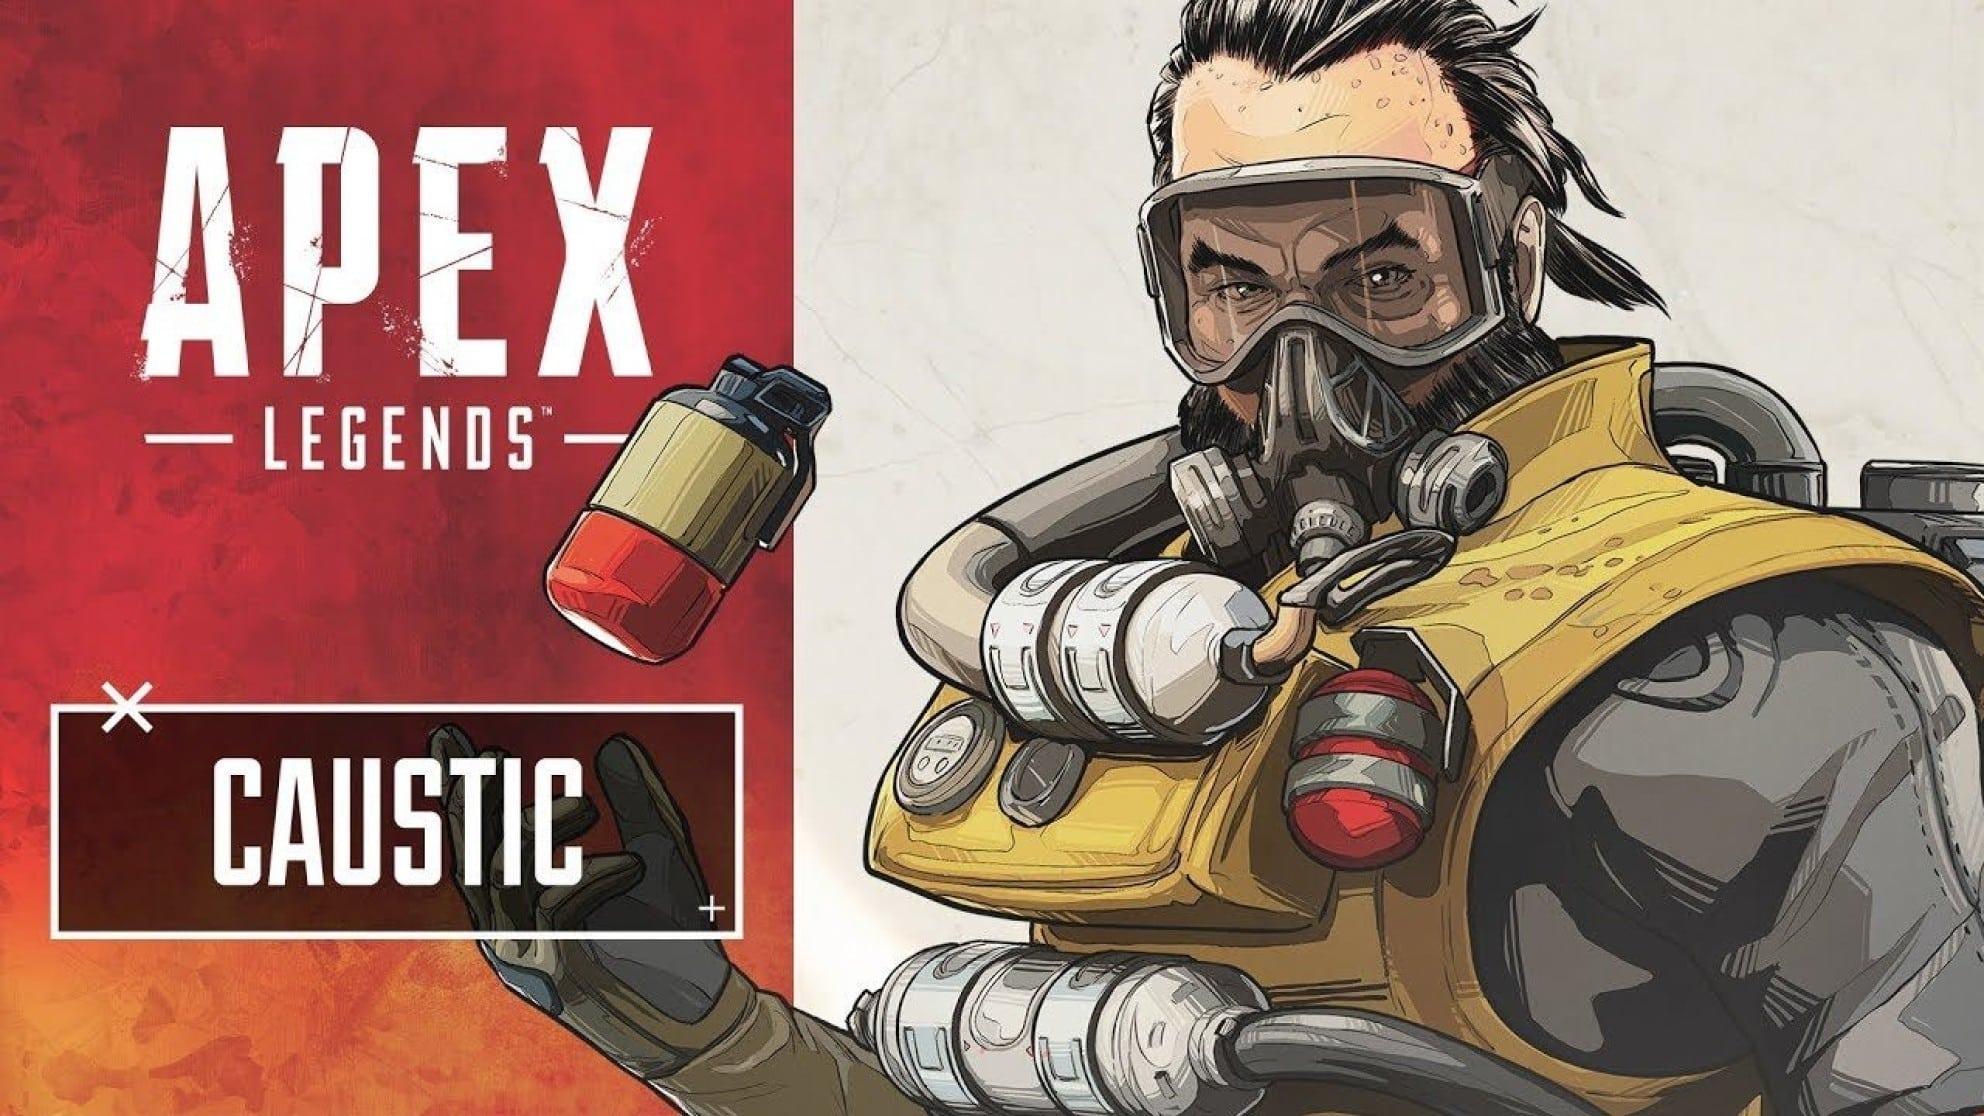 Caustic, Toxic Trapper, Apex Legends